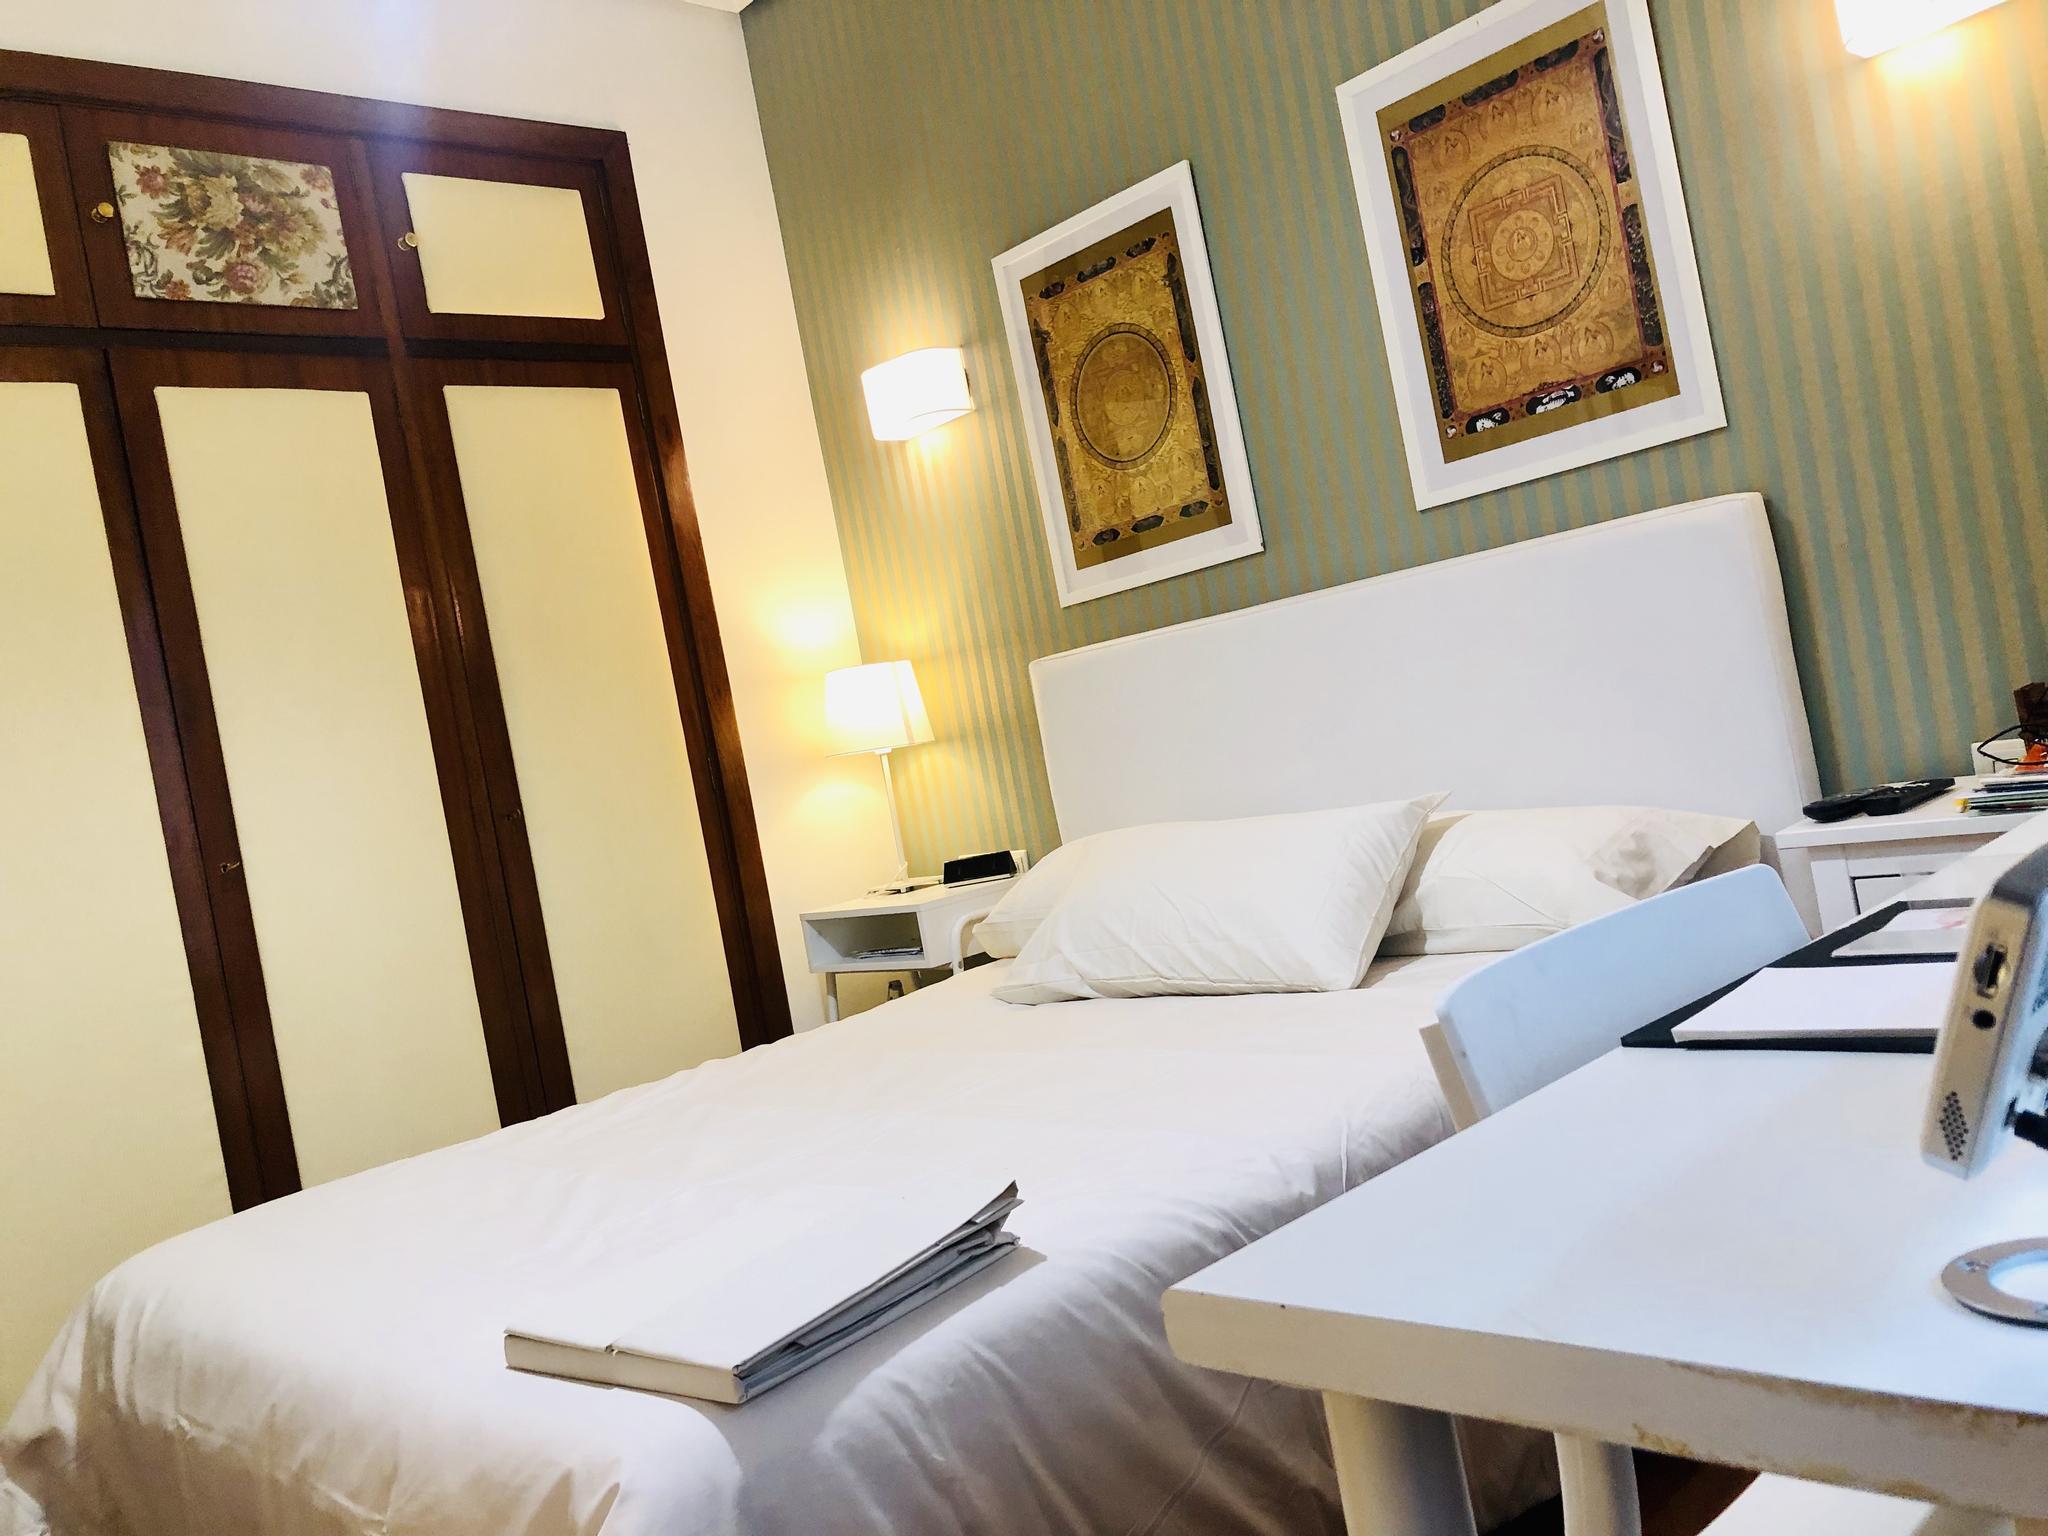 Heros Kalea- Spacious room with terrace in Bilbao